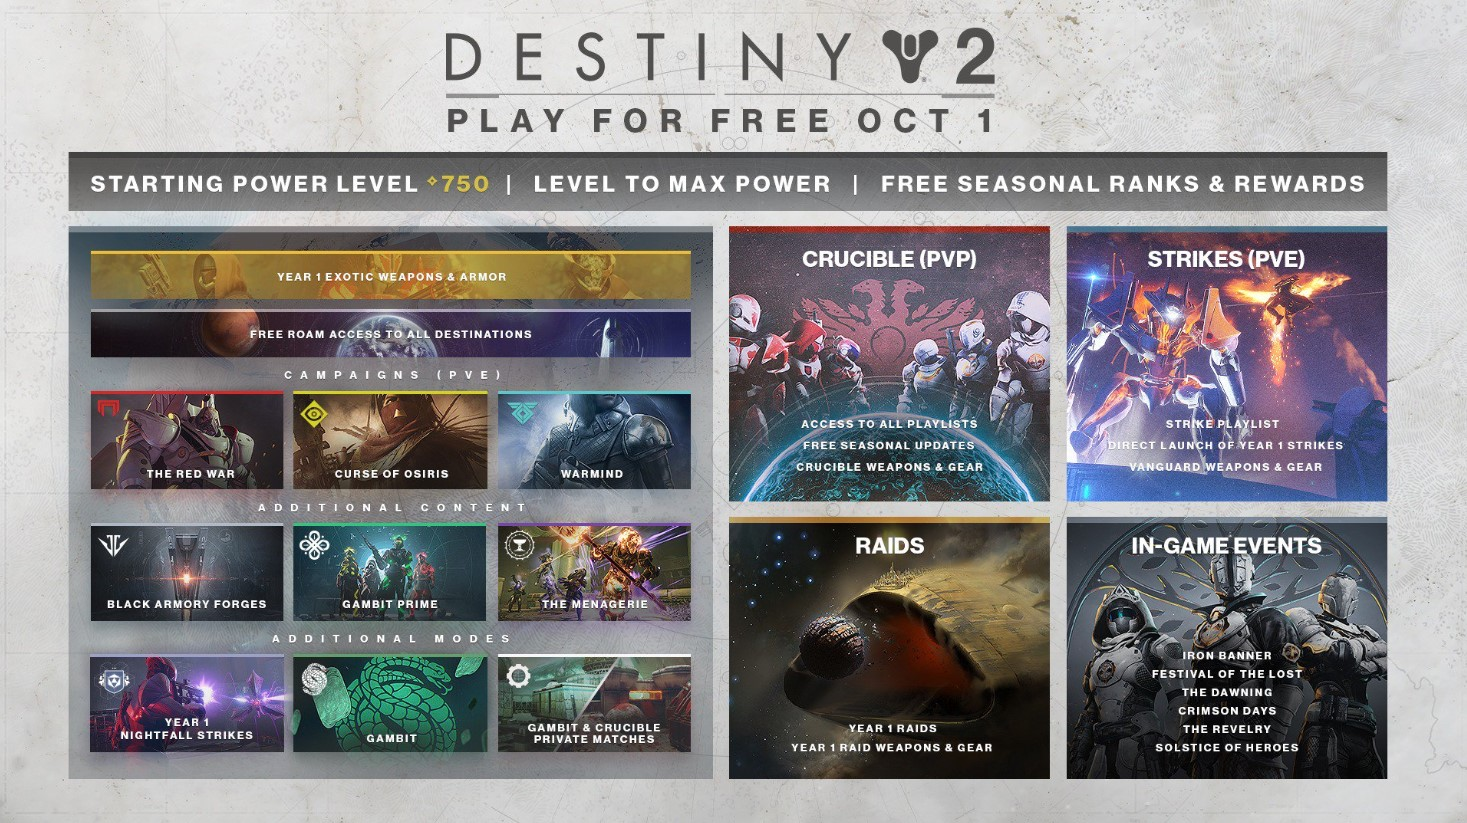 Destiny 2 Free To Play Content